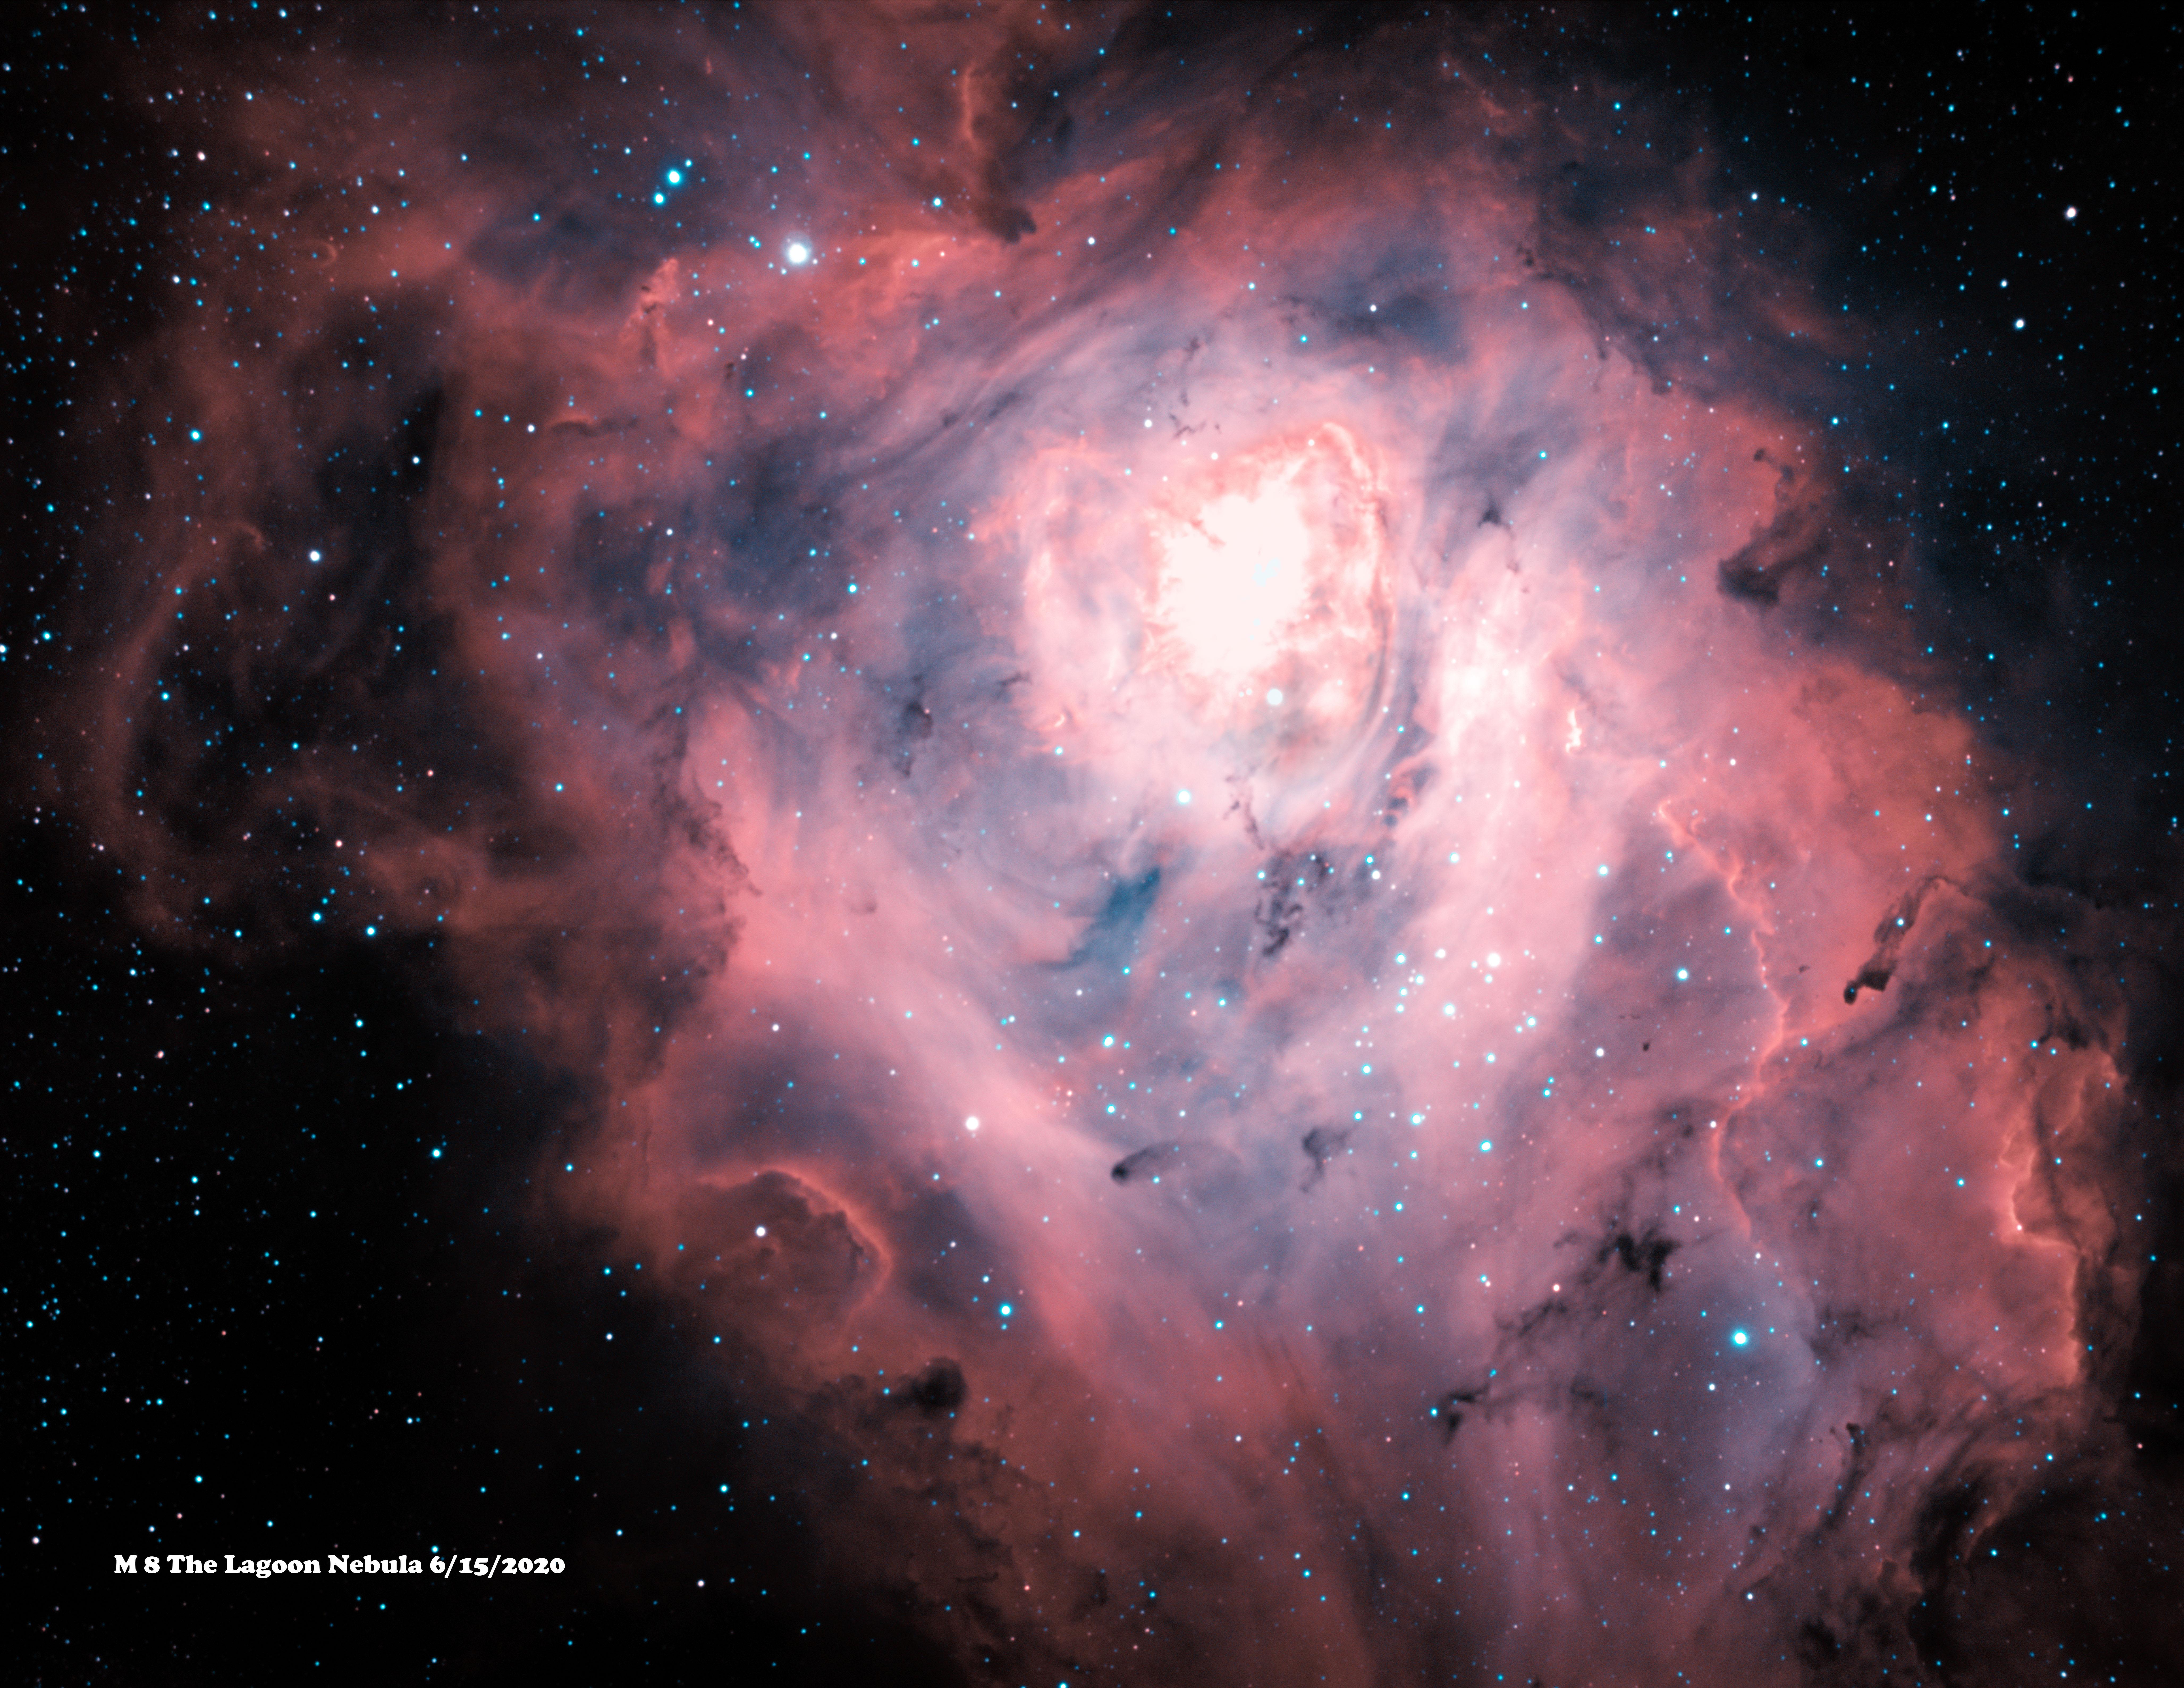 M8 HaOiii 6-15-2020